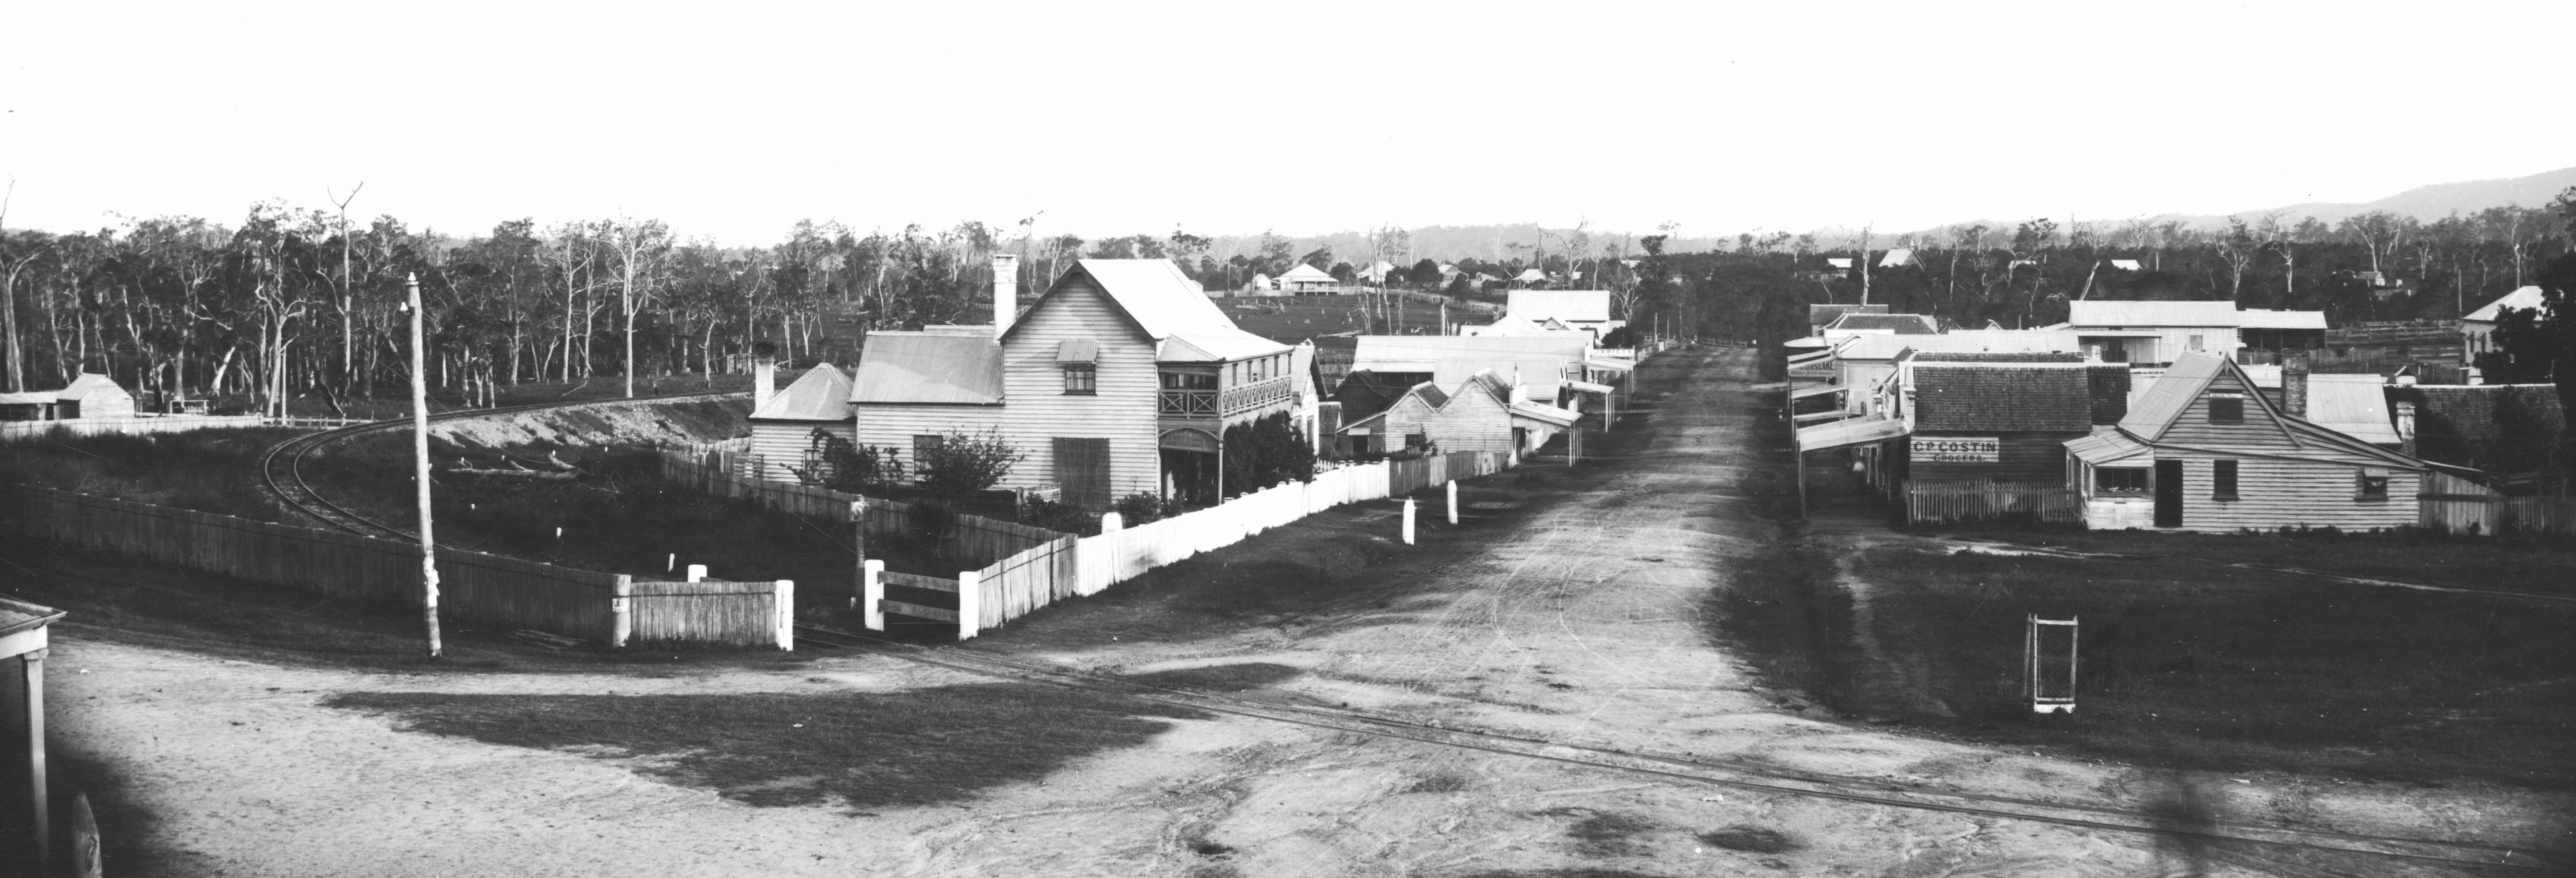 beenleigh ca 1893 crop slq